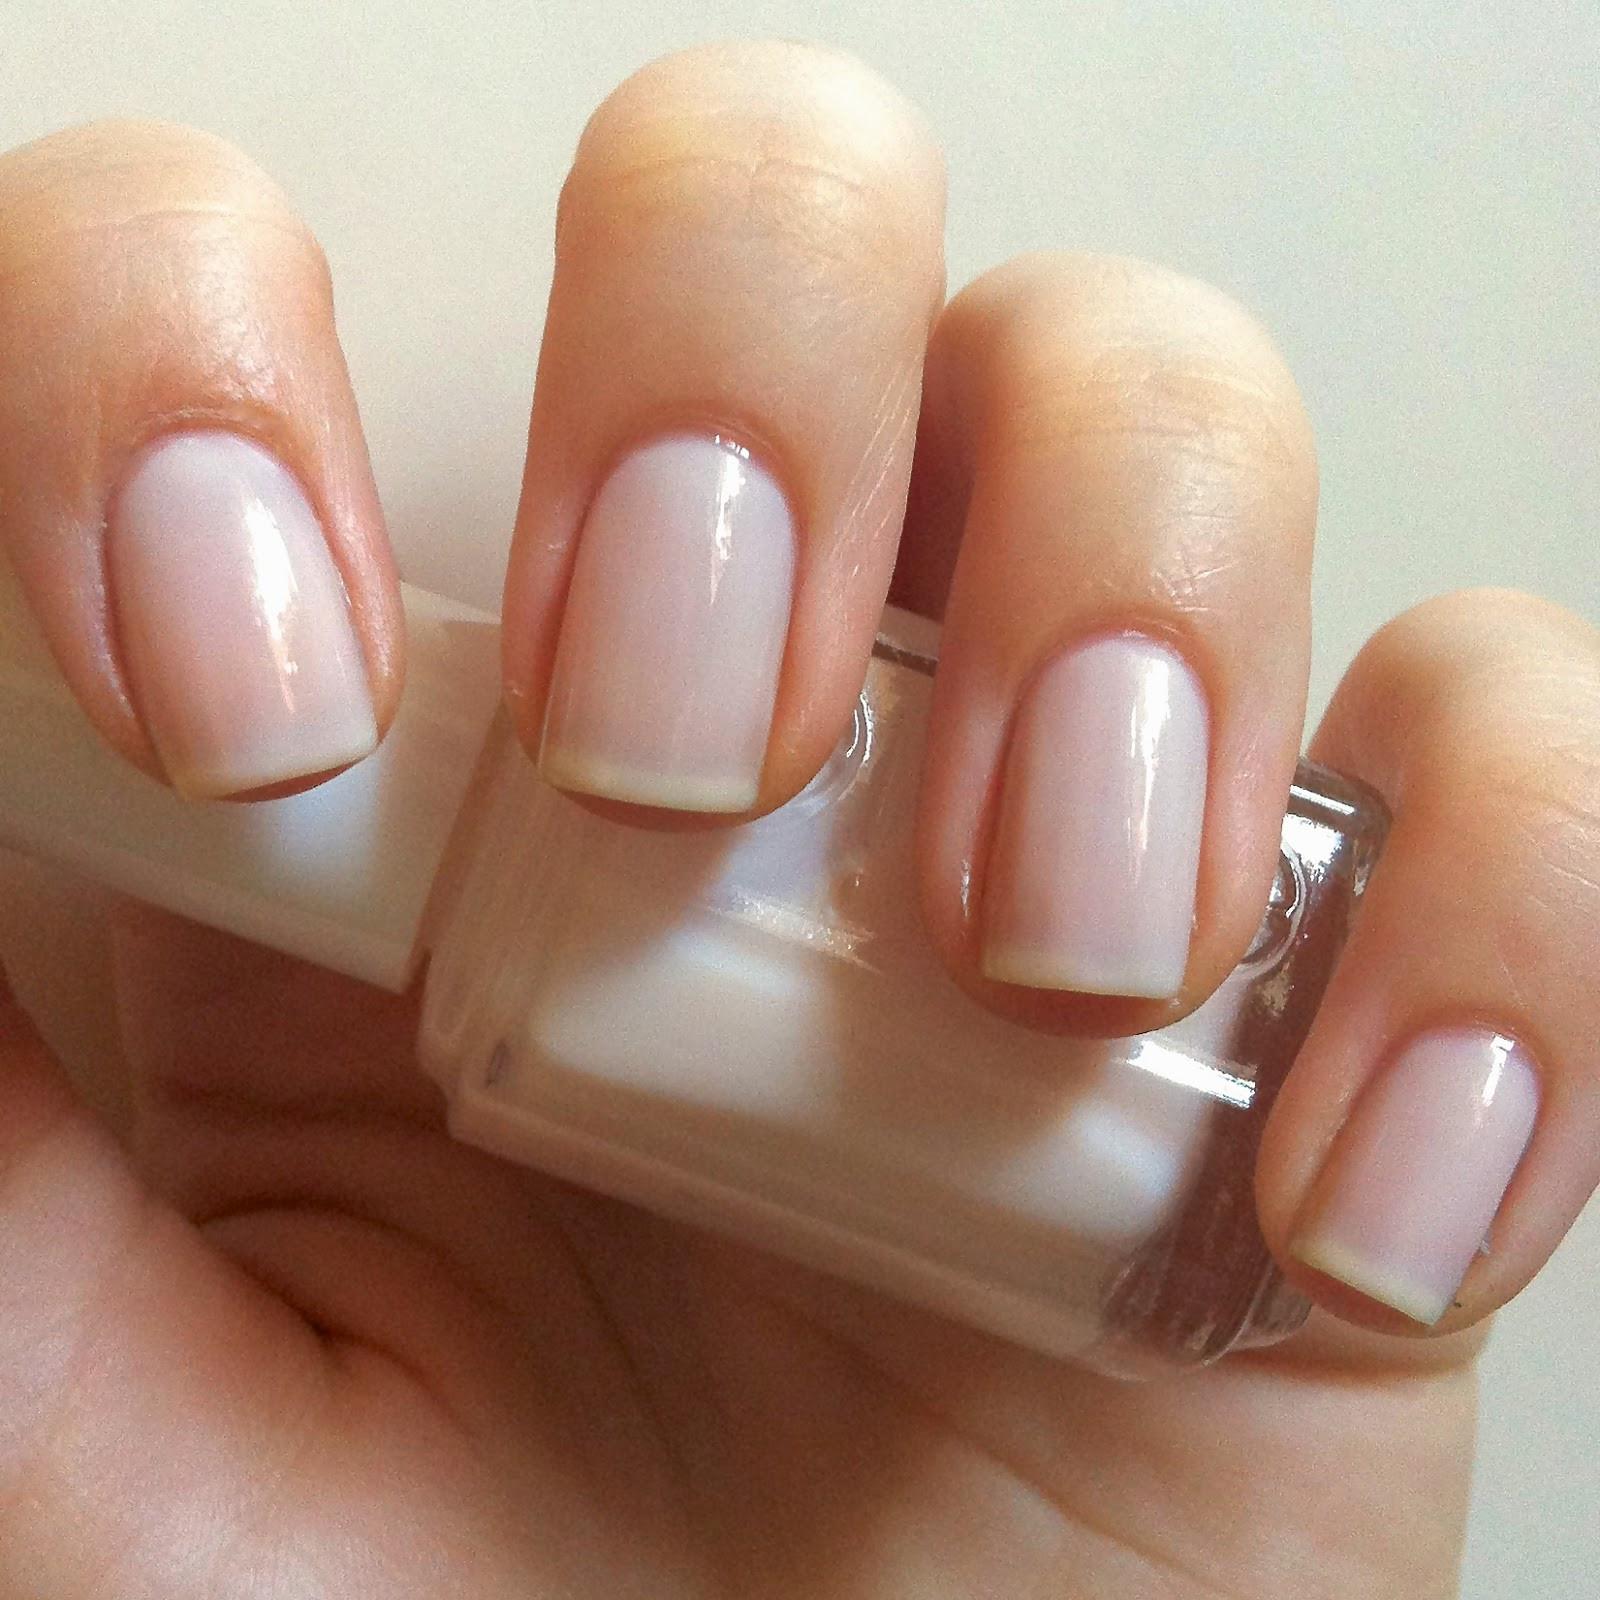 Maniküre French  Nails Always Polished April 2014